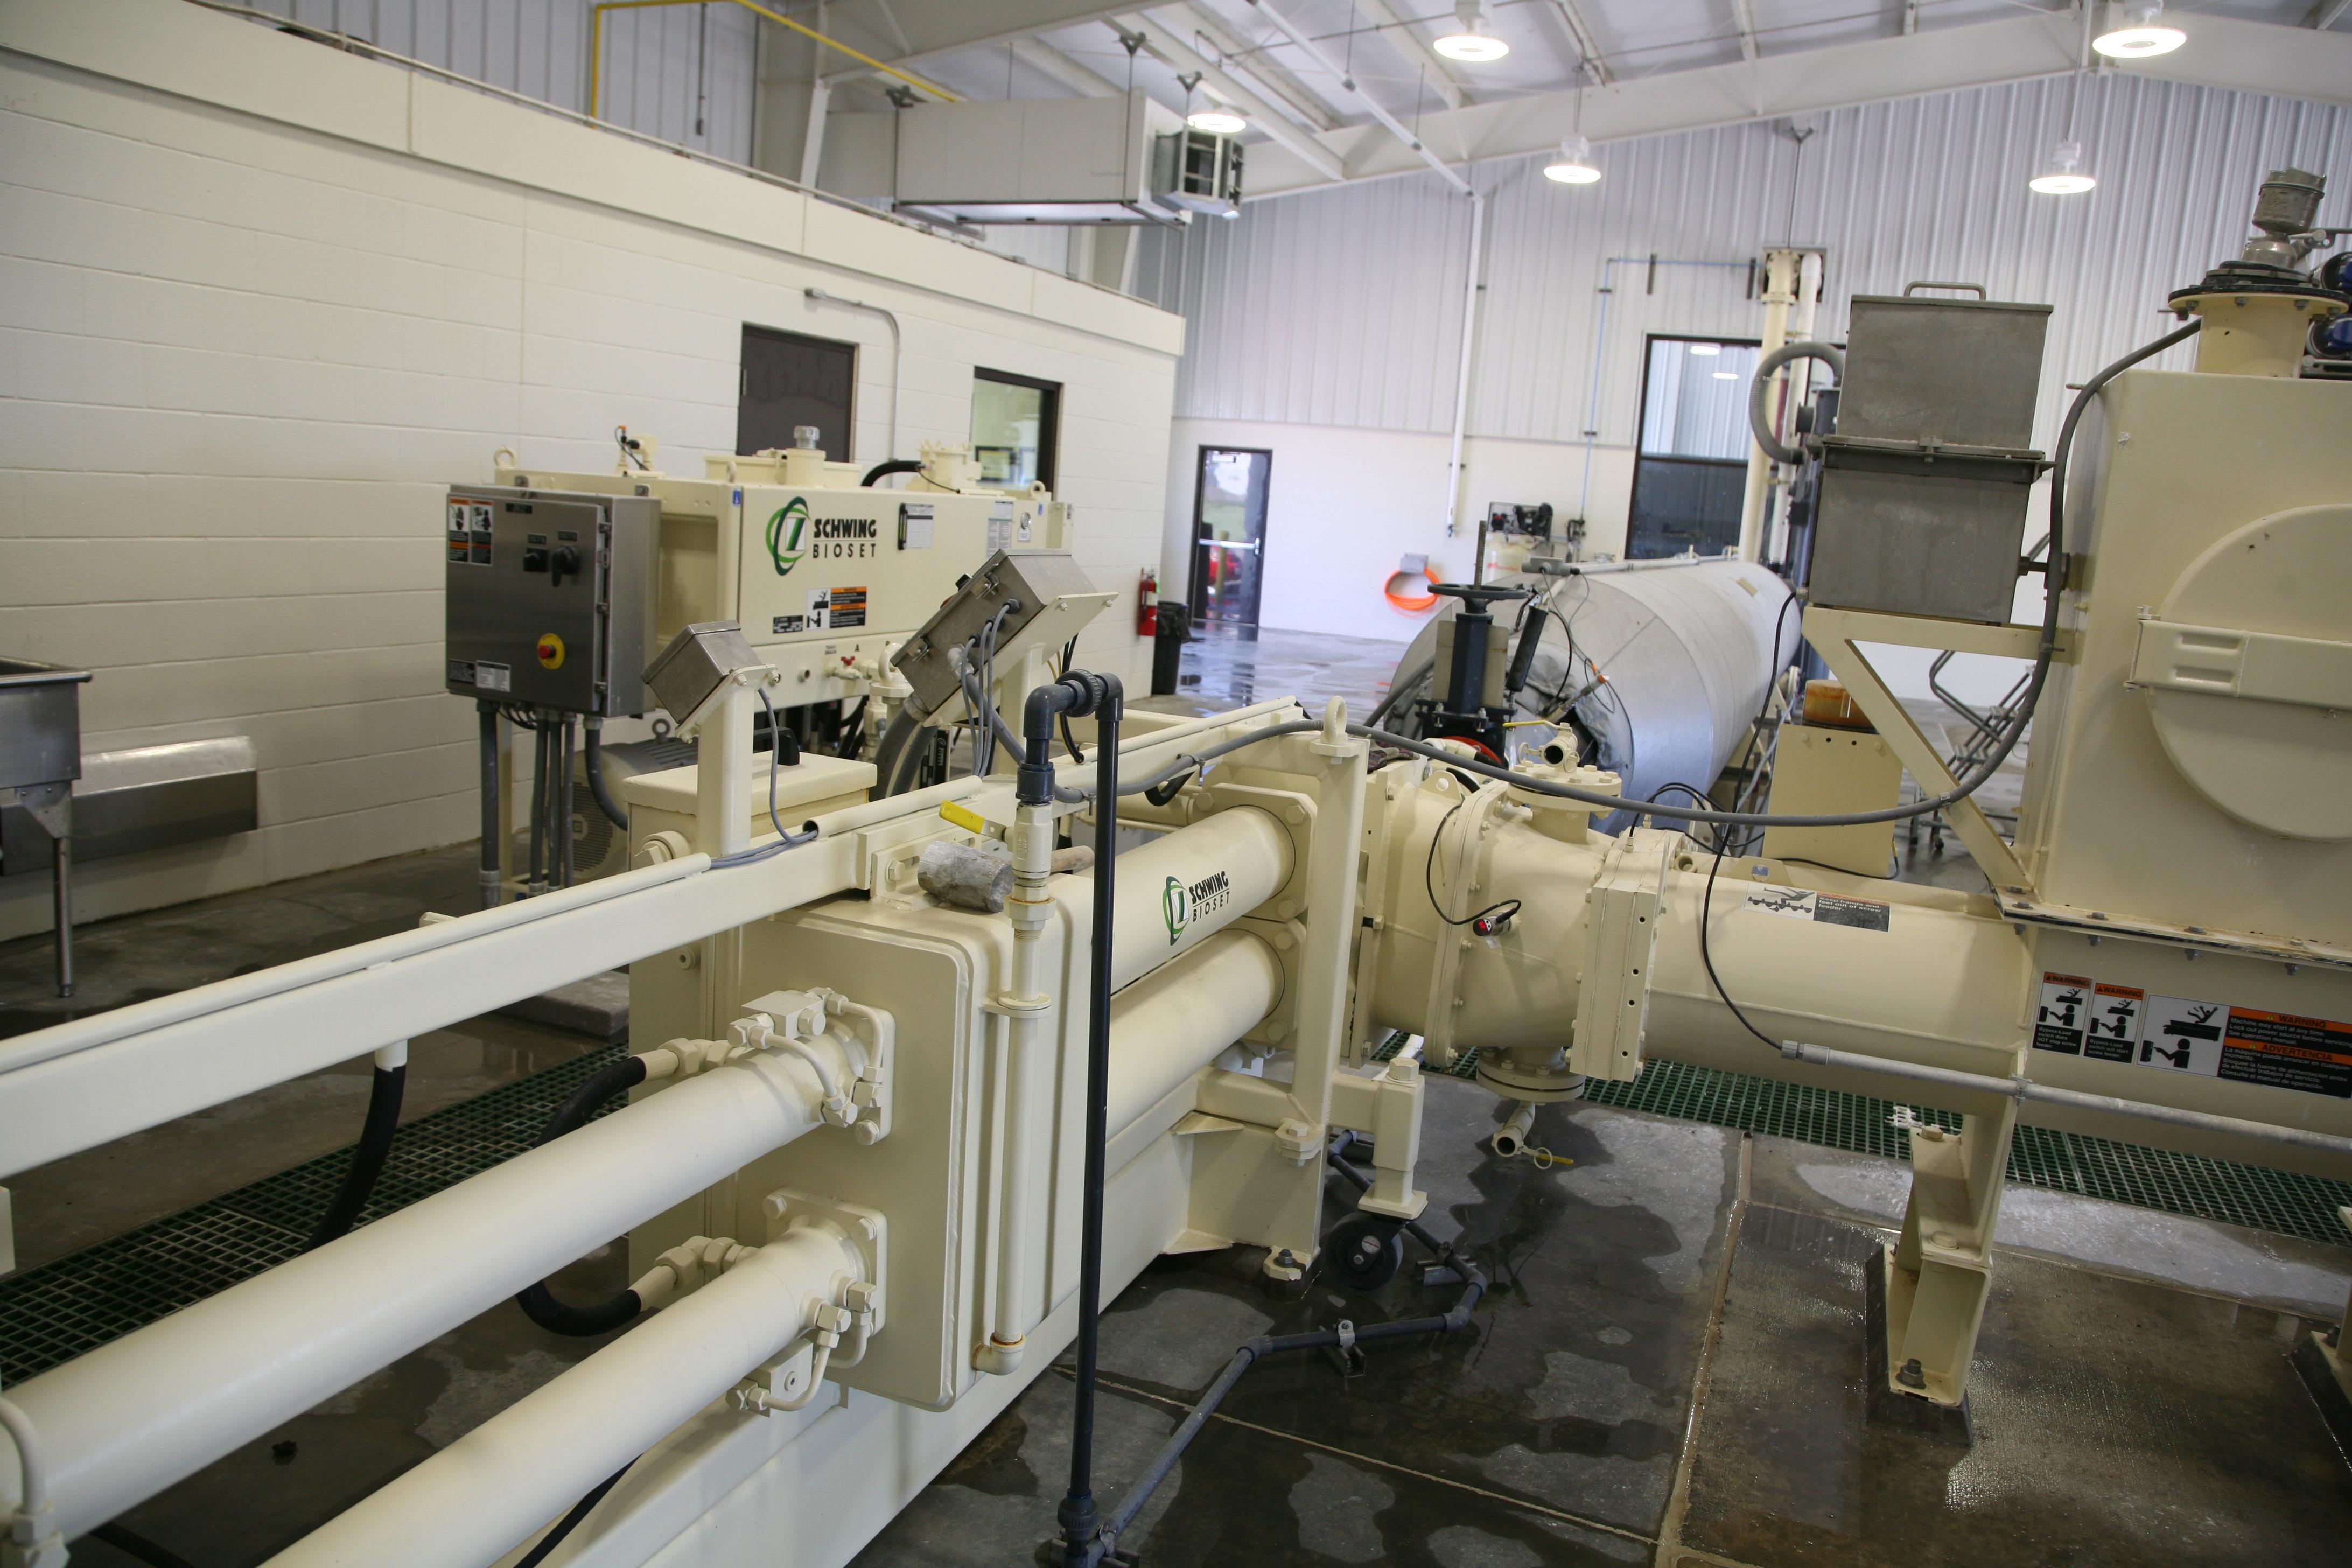 Schwing Bioset Pump and Reactor